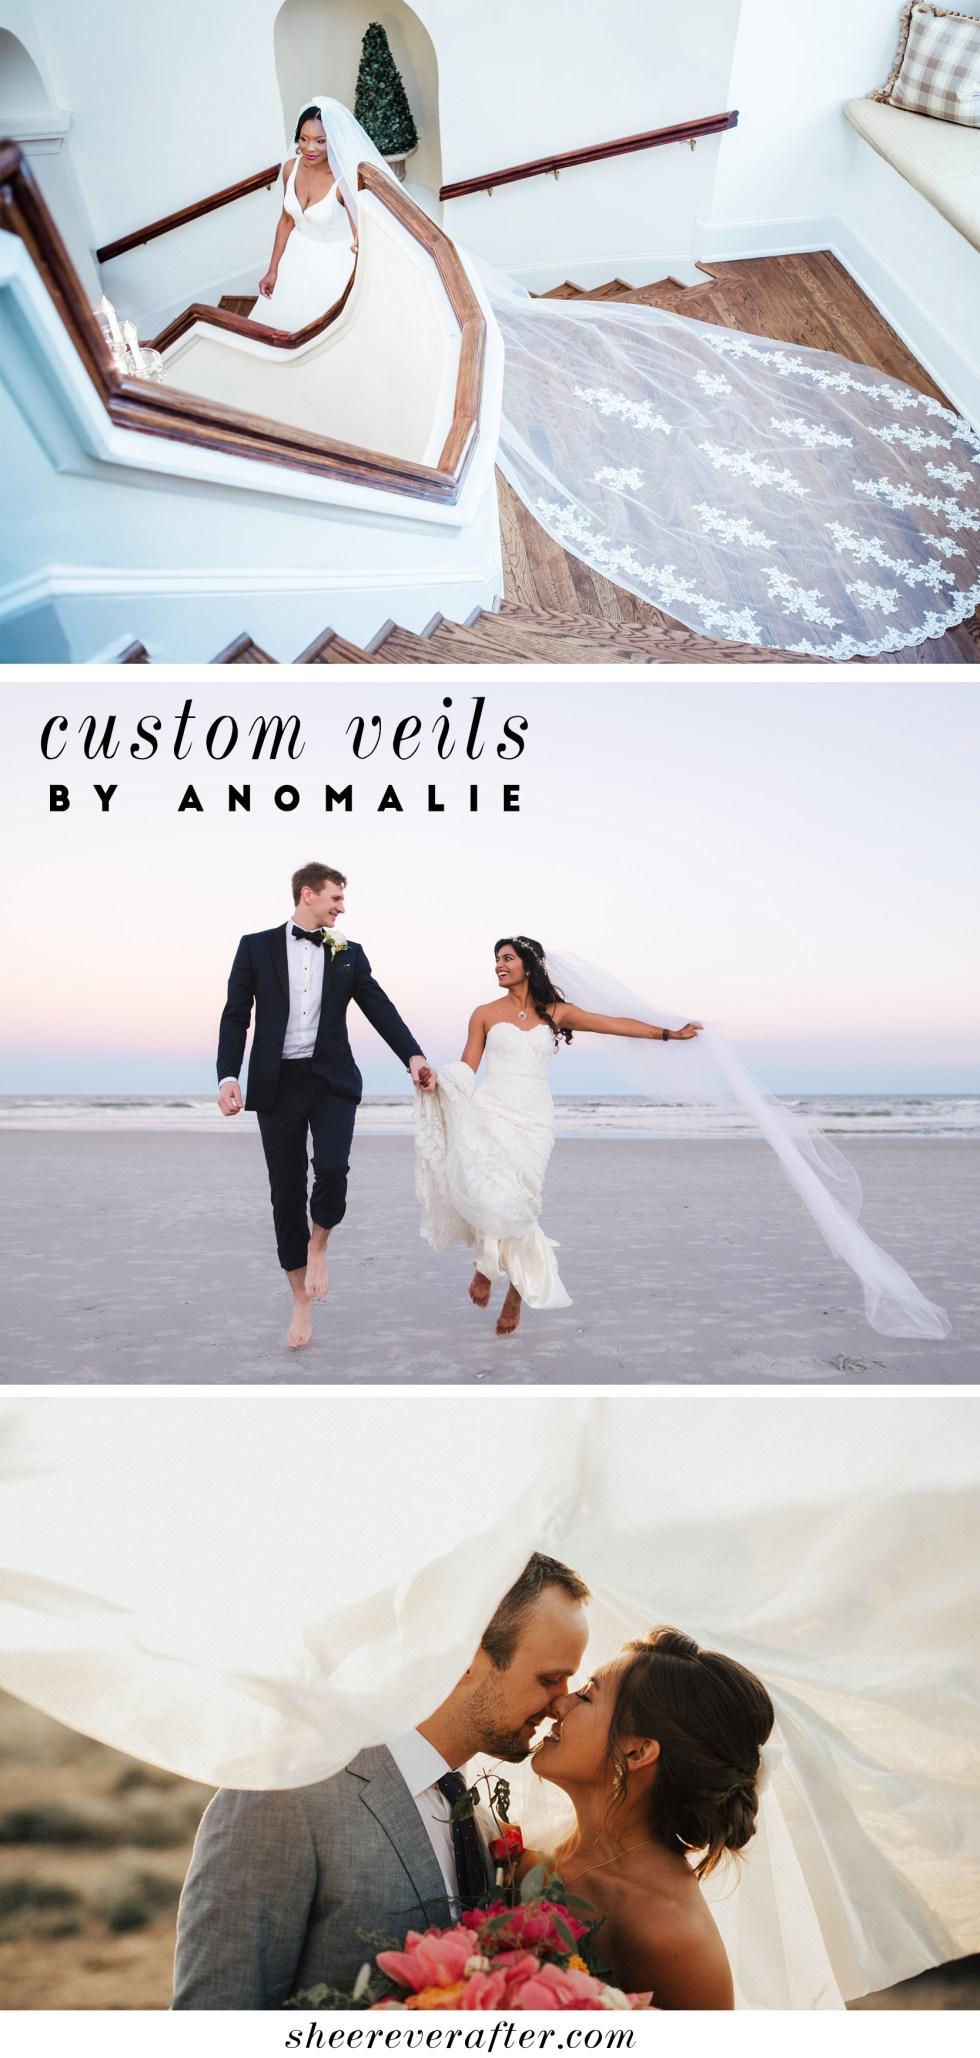 Custom veils by Anomalie | SheerEverAfter.com